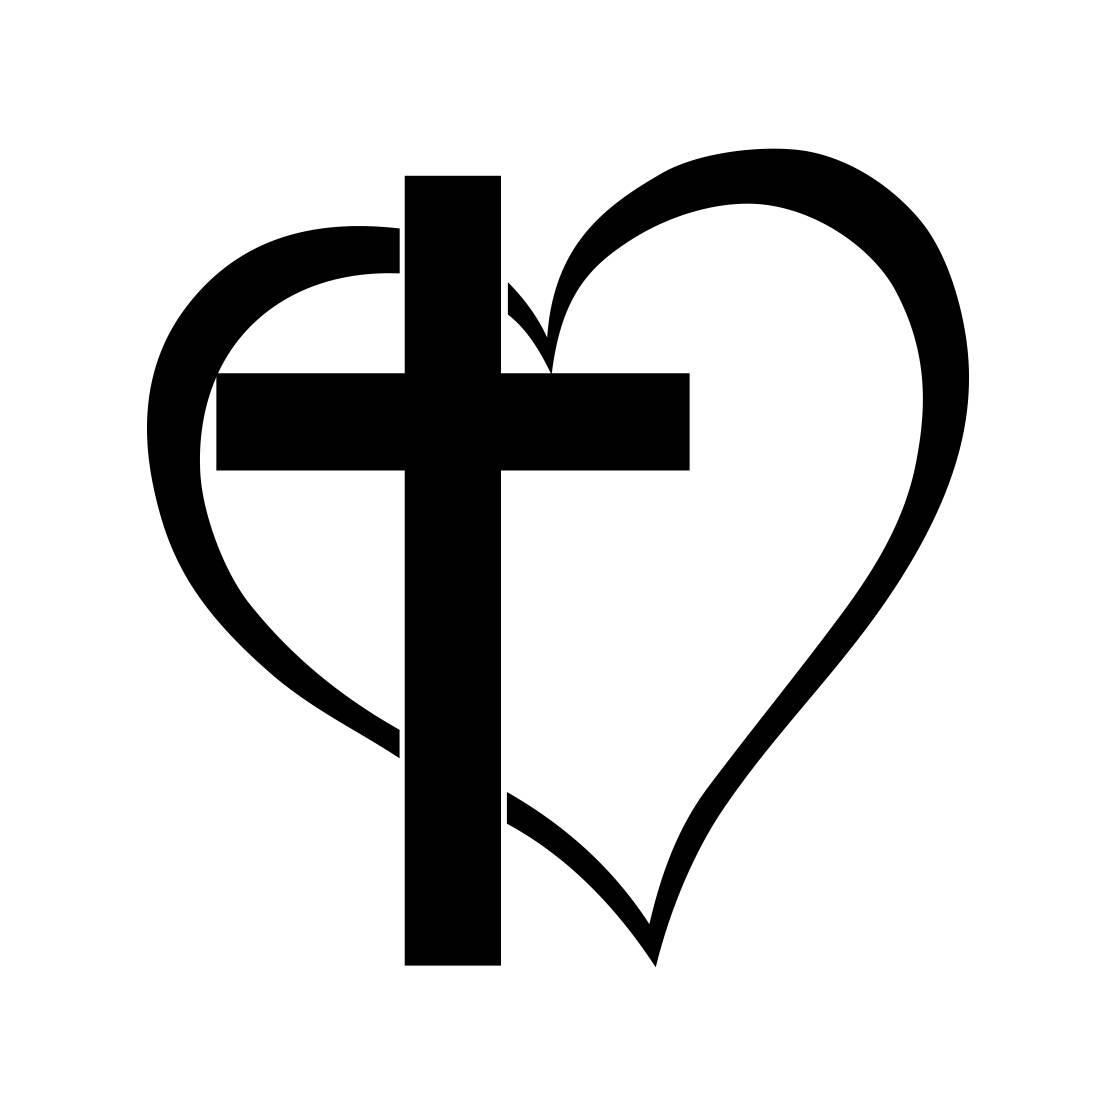 cross heart jesus god heart love graphics svg dxf eps png cdr etsy rh etsy com cross country vector art gothic cross vector art